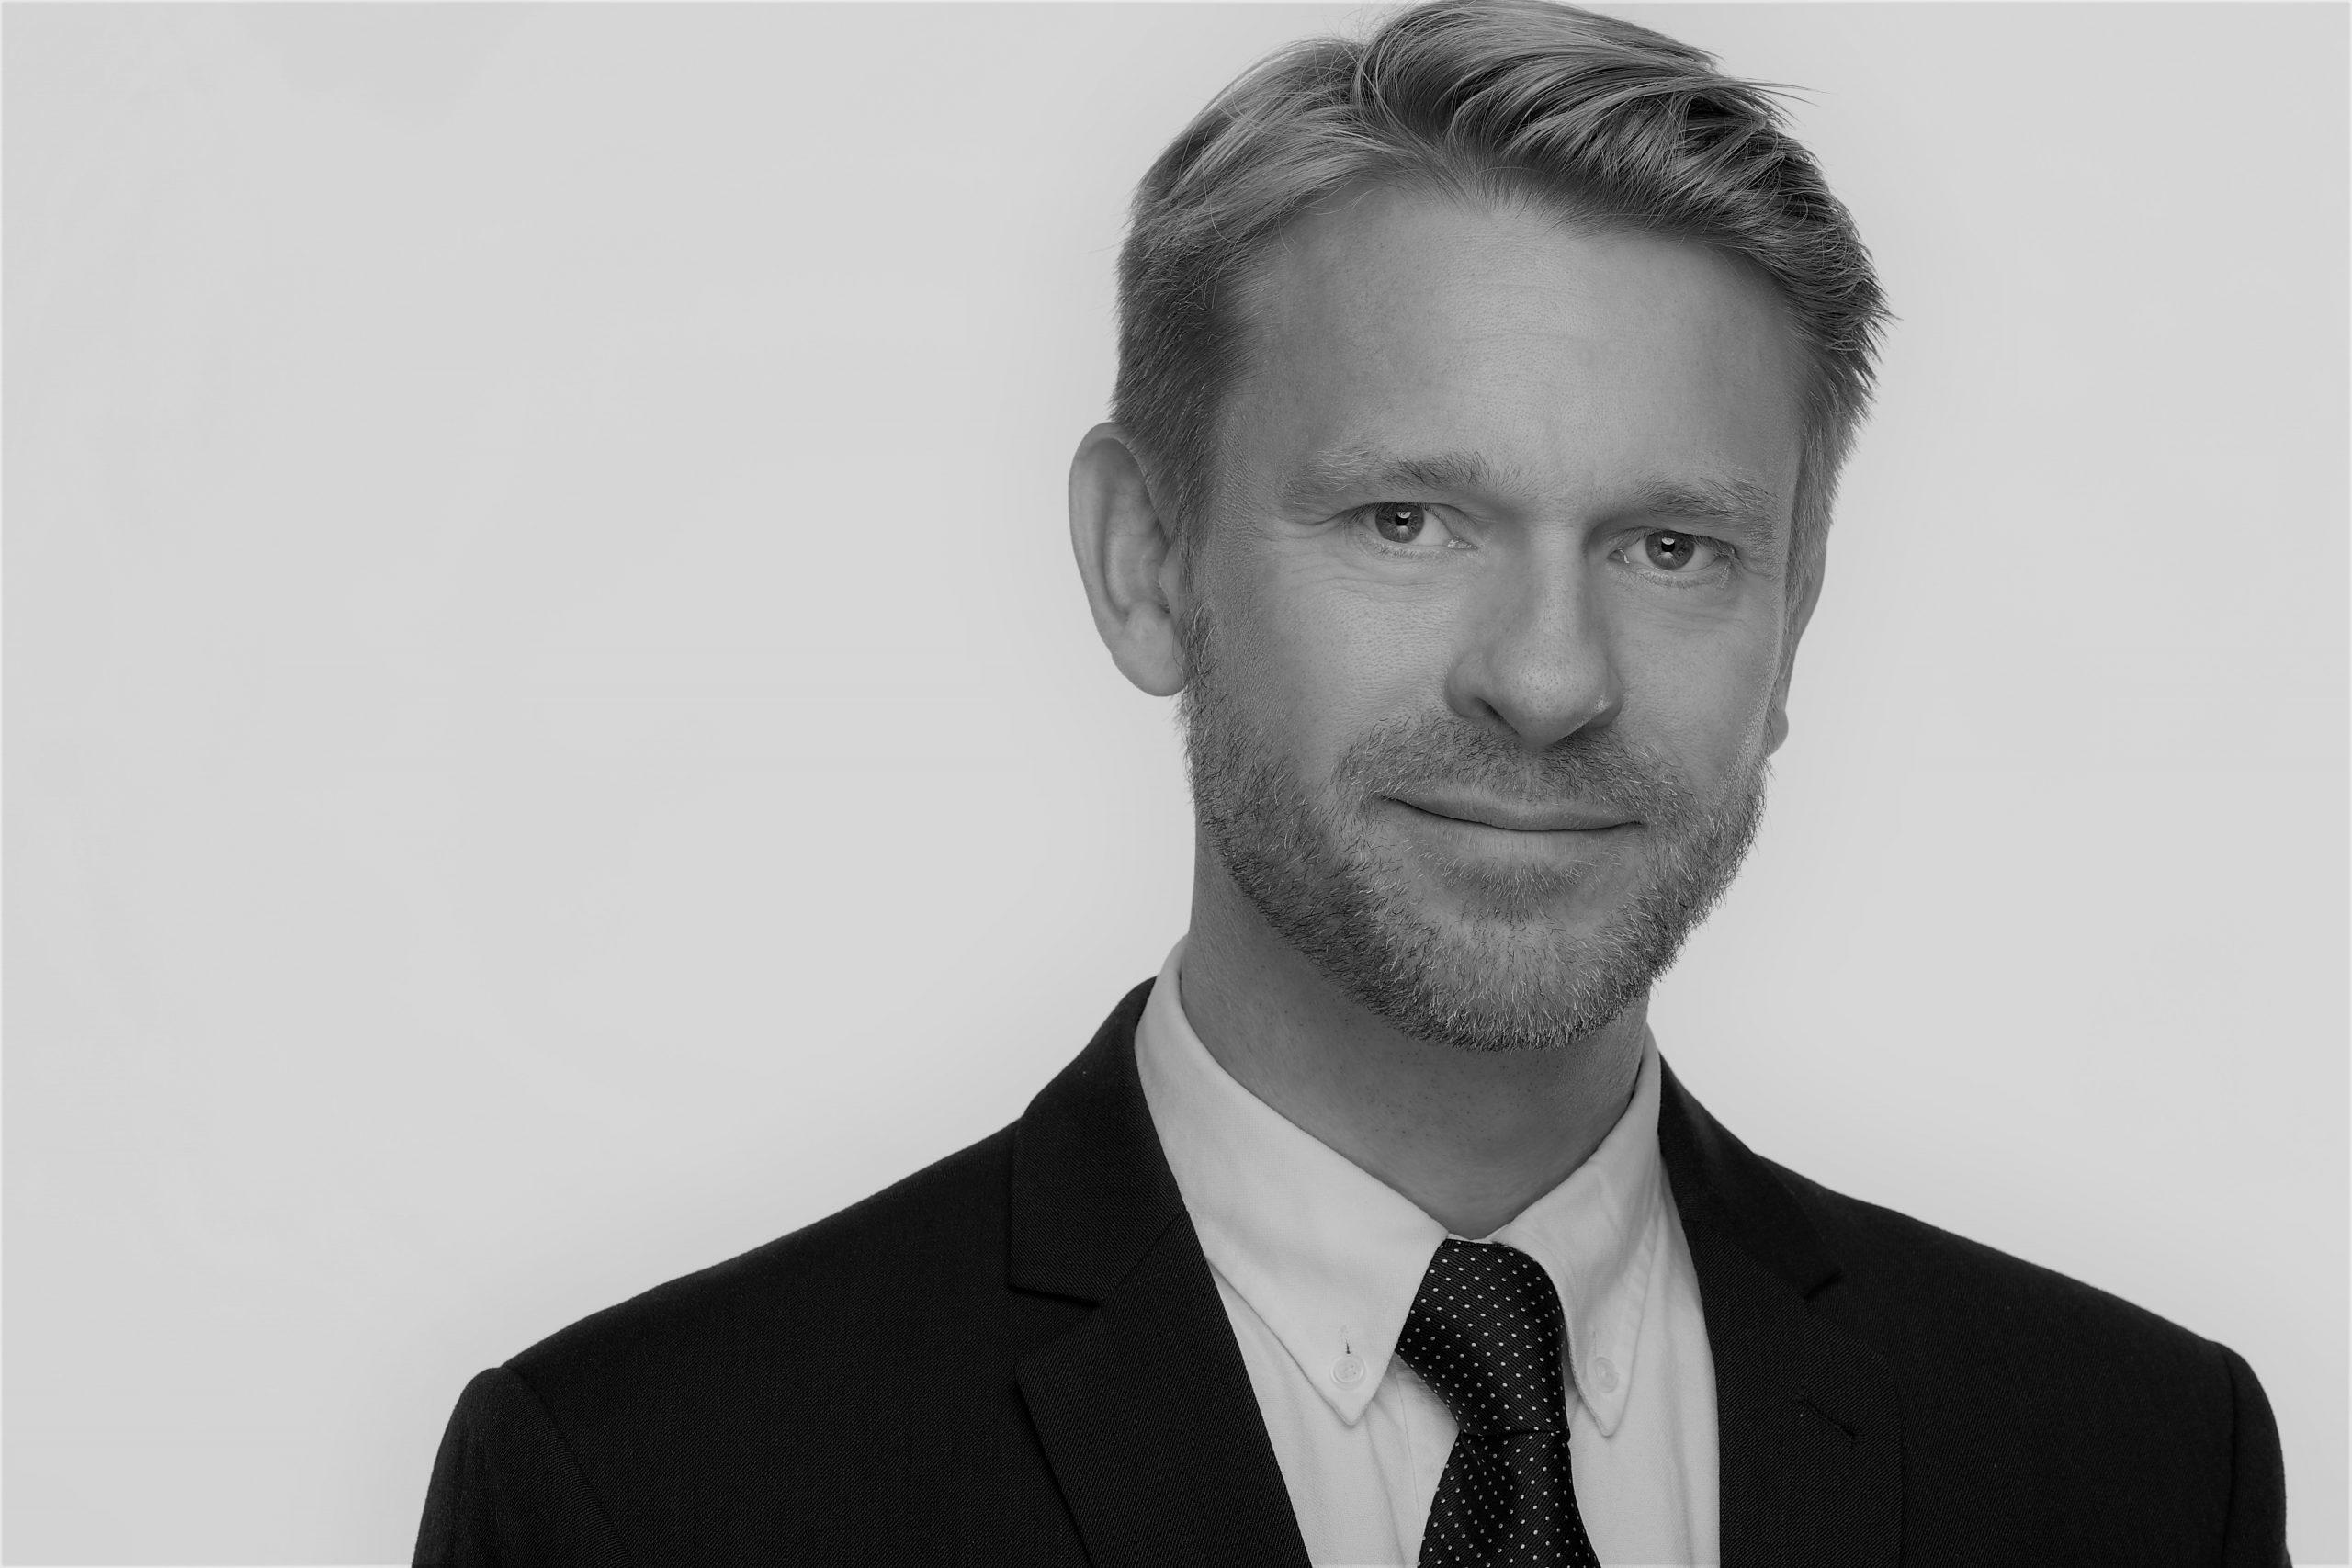 Dr. Martin Halle